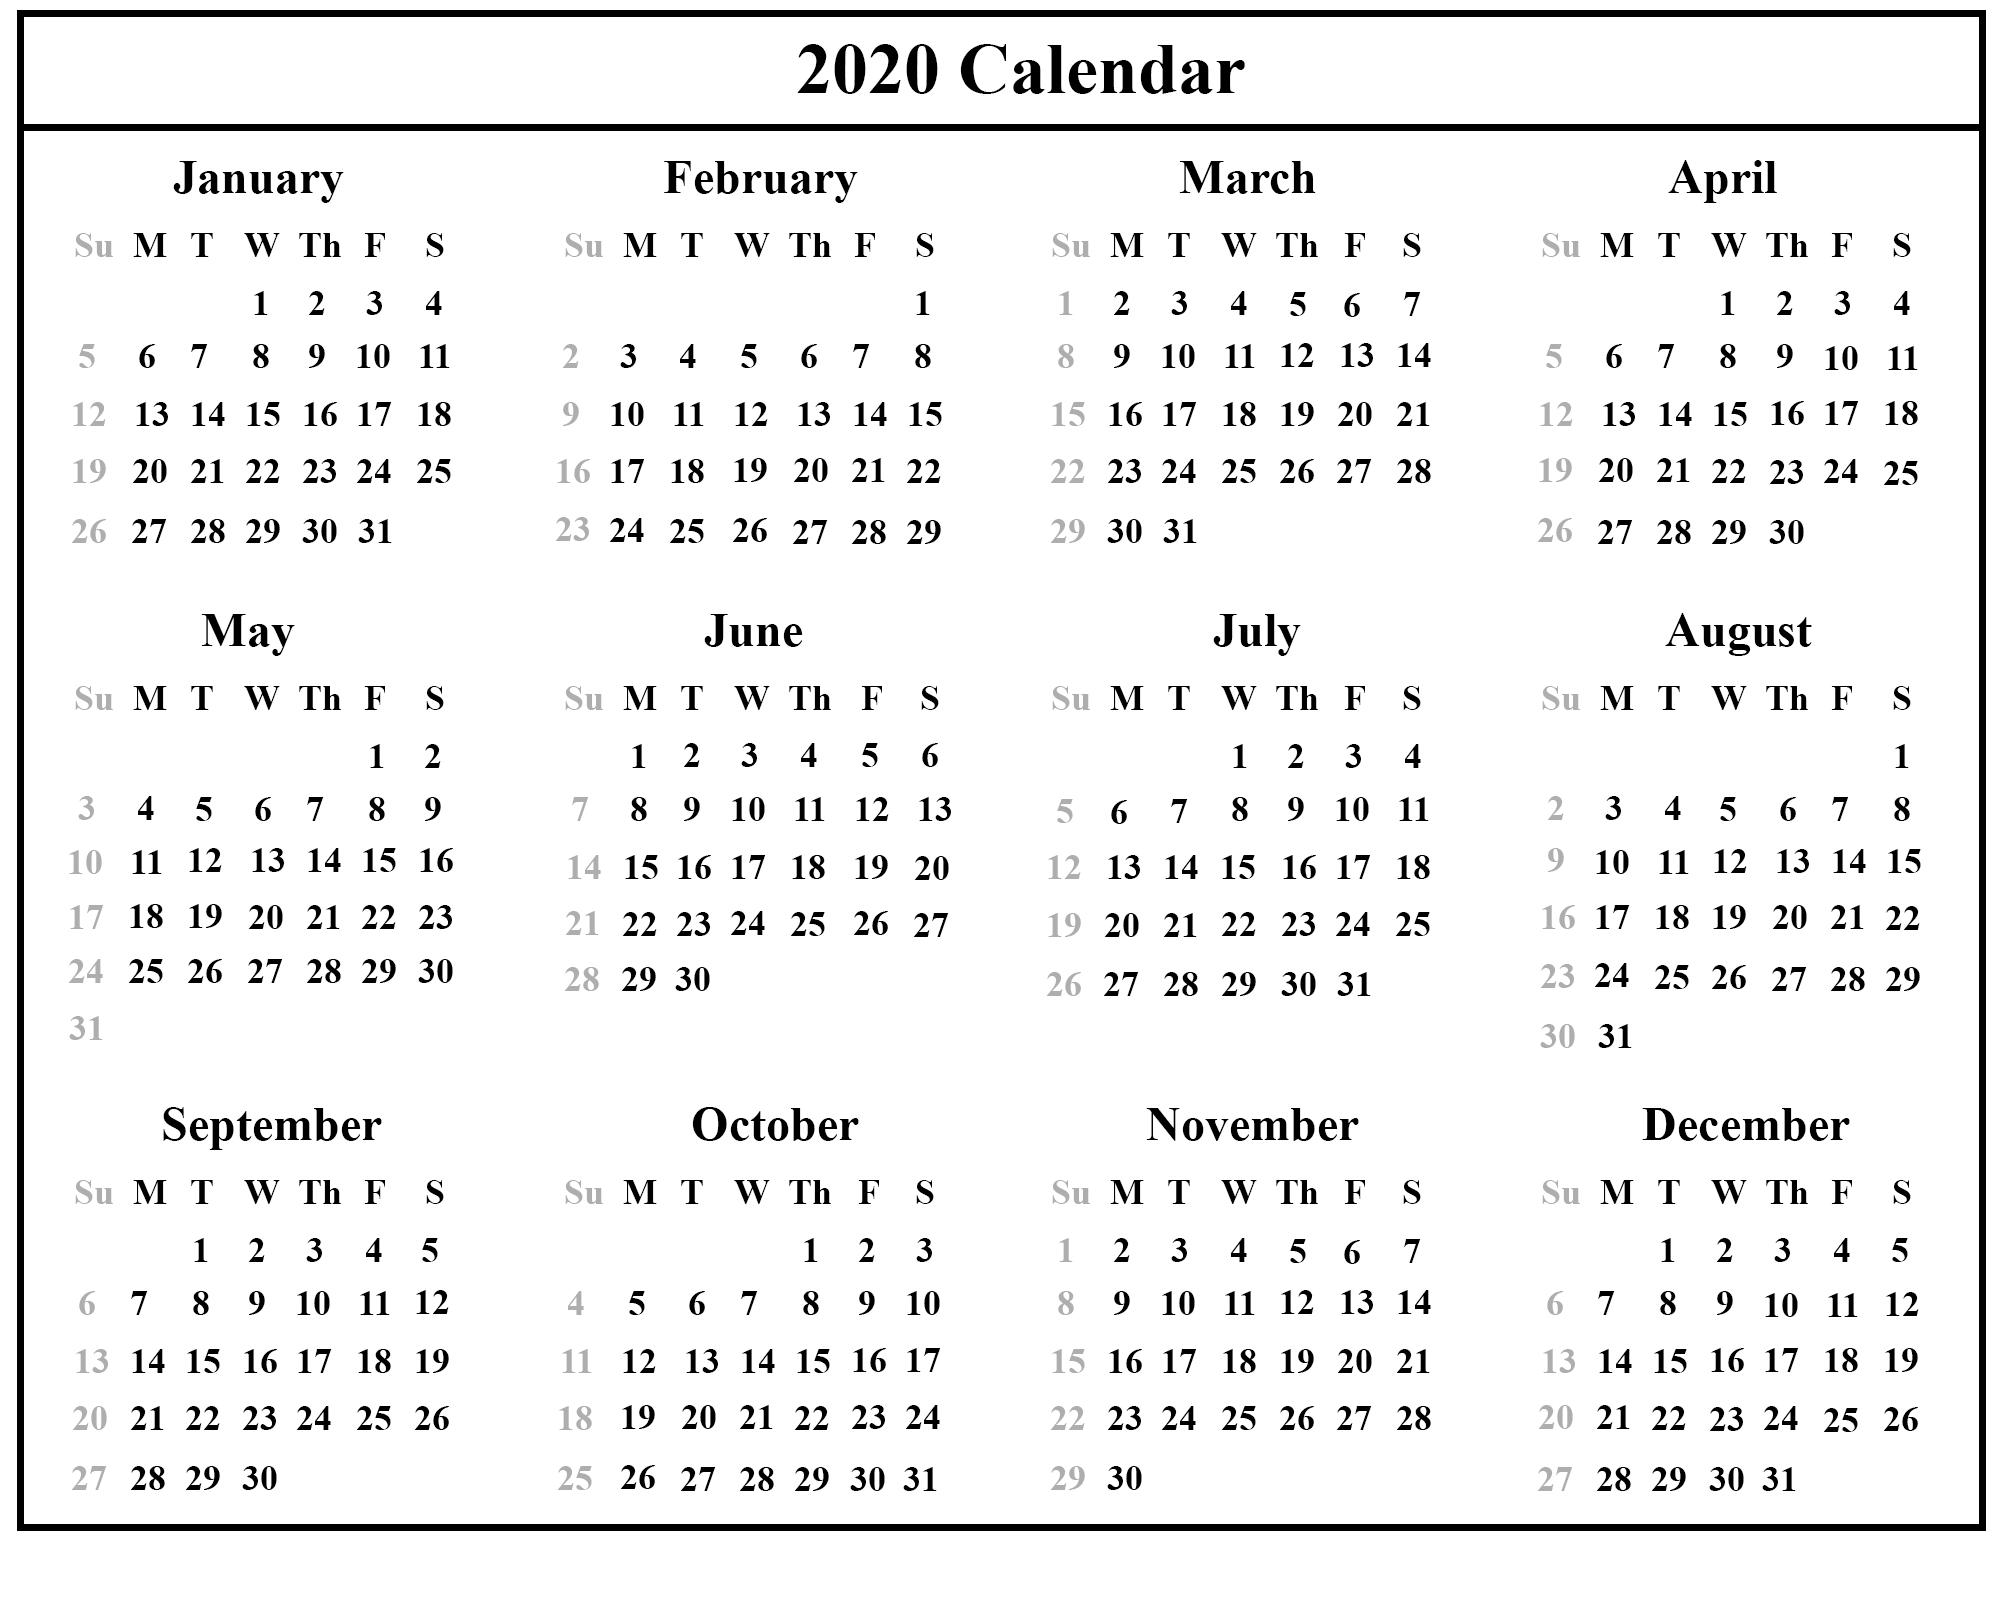 Editable 2020 Calendar Printable Template Blank With Notes-Free Printable Attendance Calendars 2020 Templates